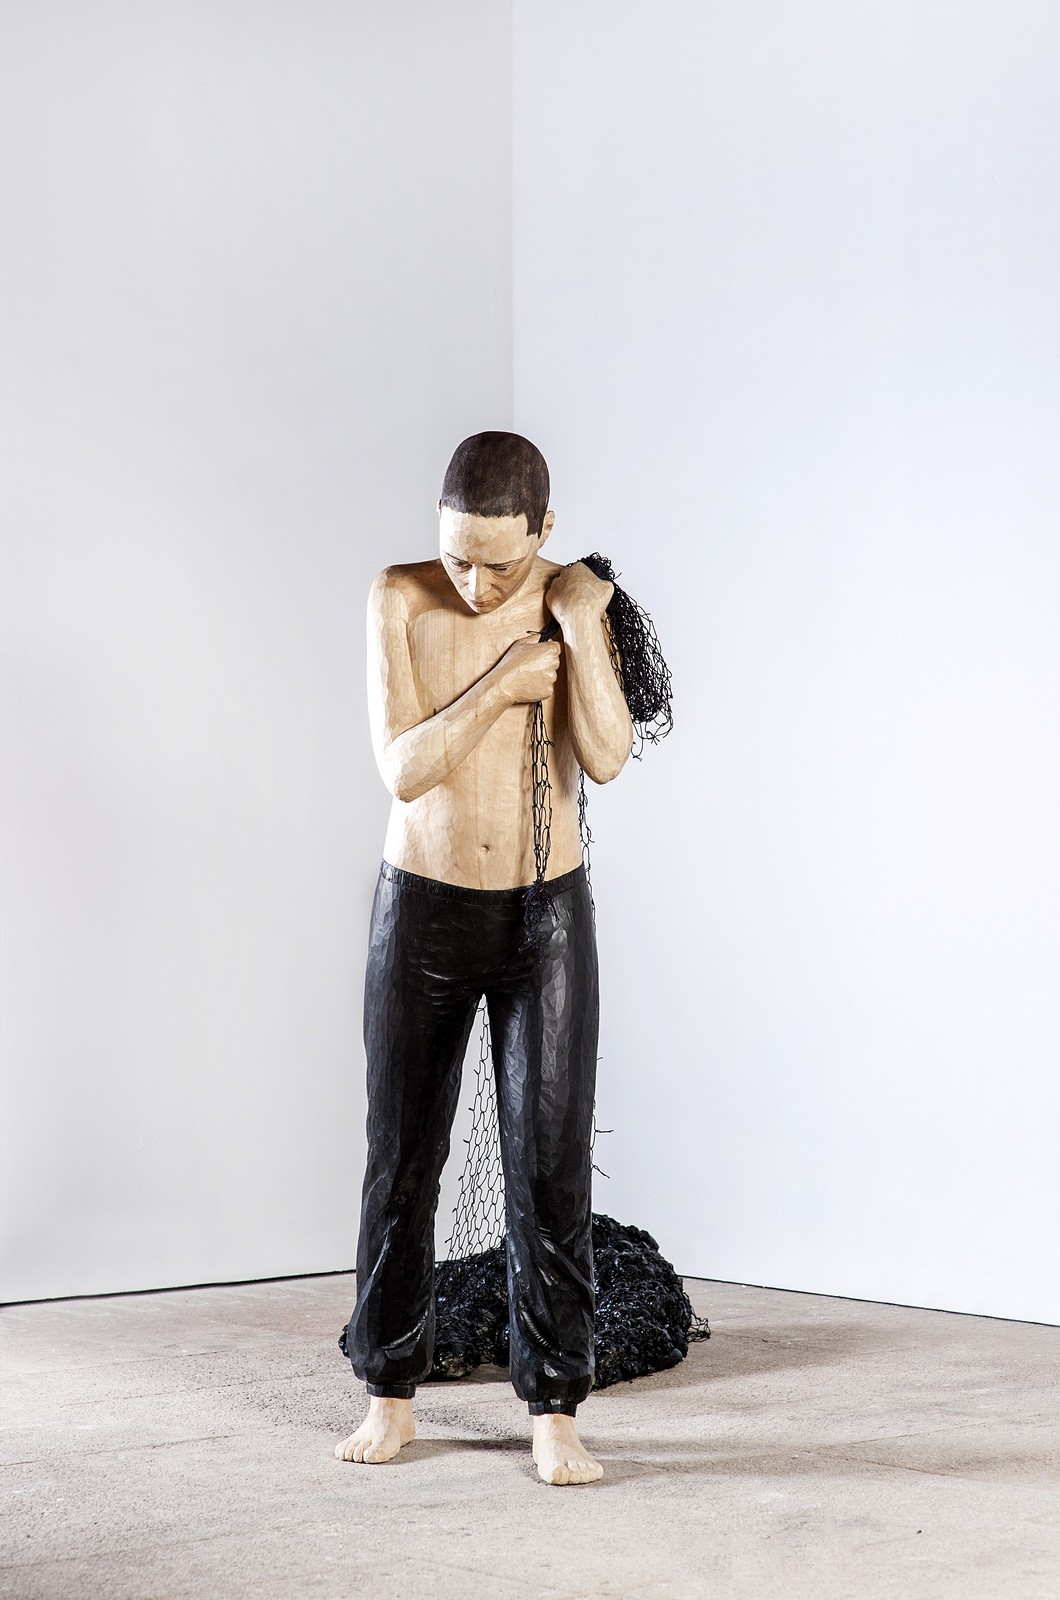 Metanoioa series, 2013, wood, 175 x 56 x 40 cm